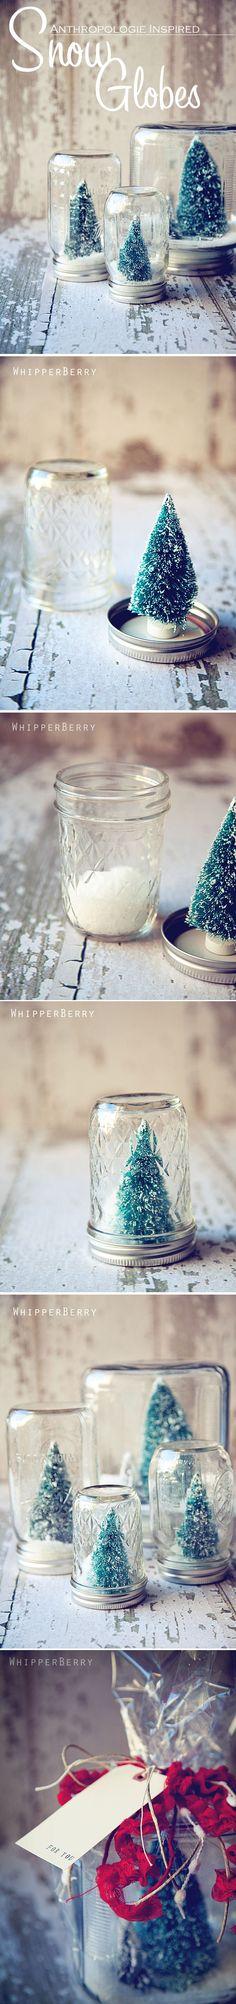 DIY snowglobes